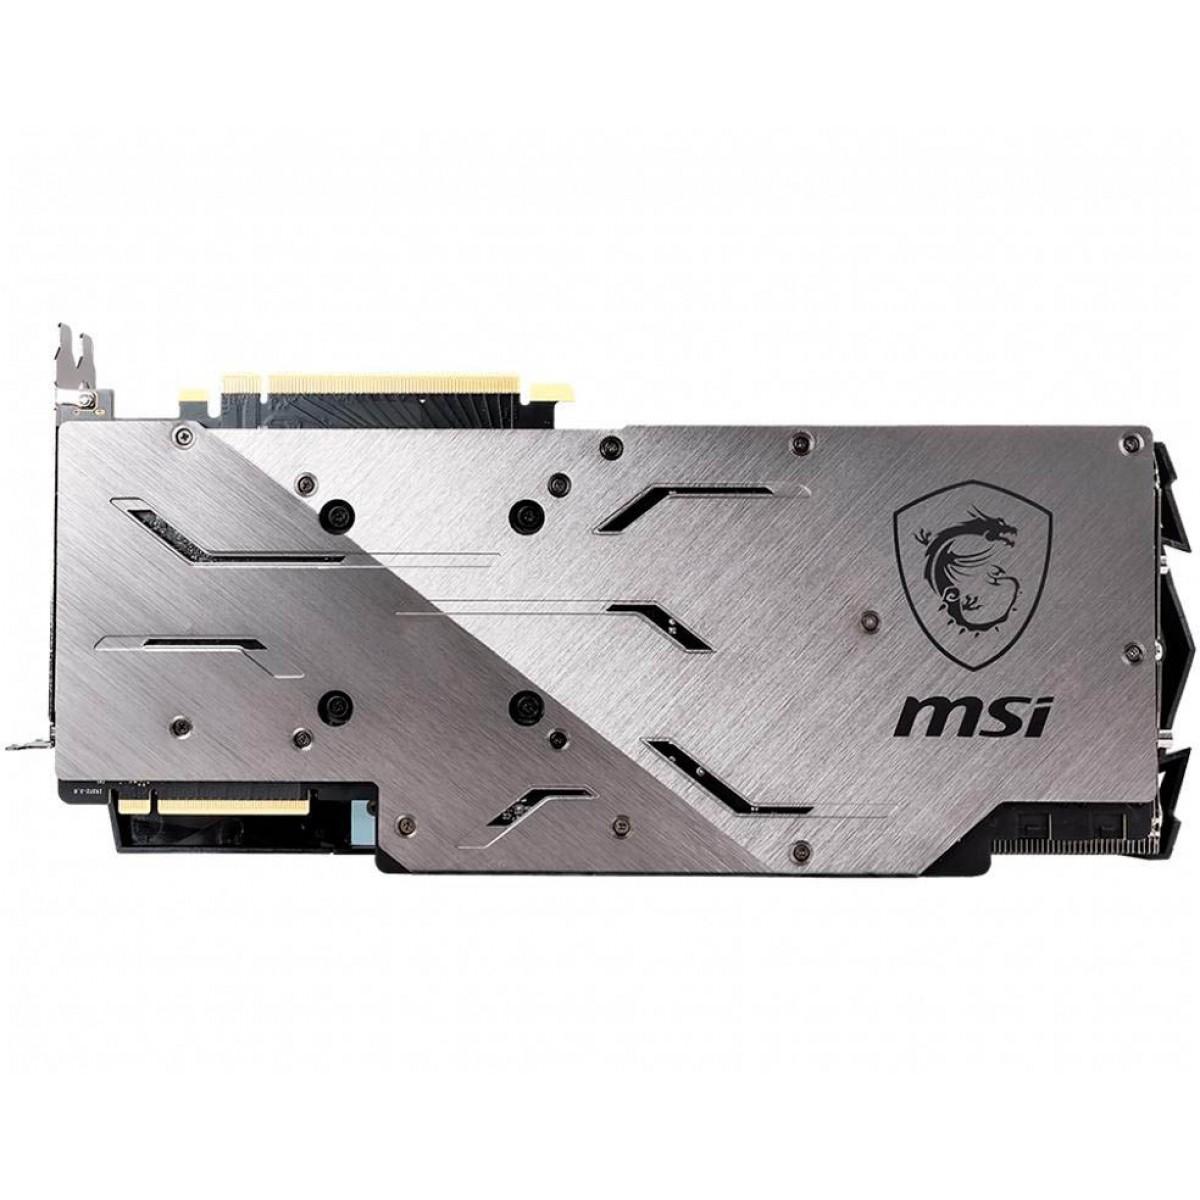 Placa de Video MSI GeForce RTX 2080 Super Gaming X TRIO, 8GB GDDR6, 256bit